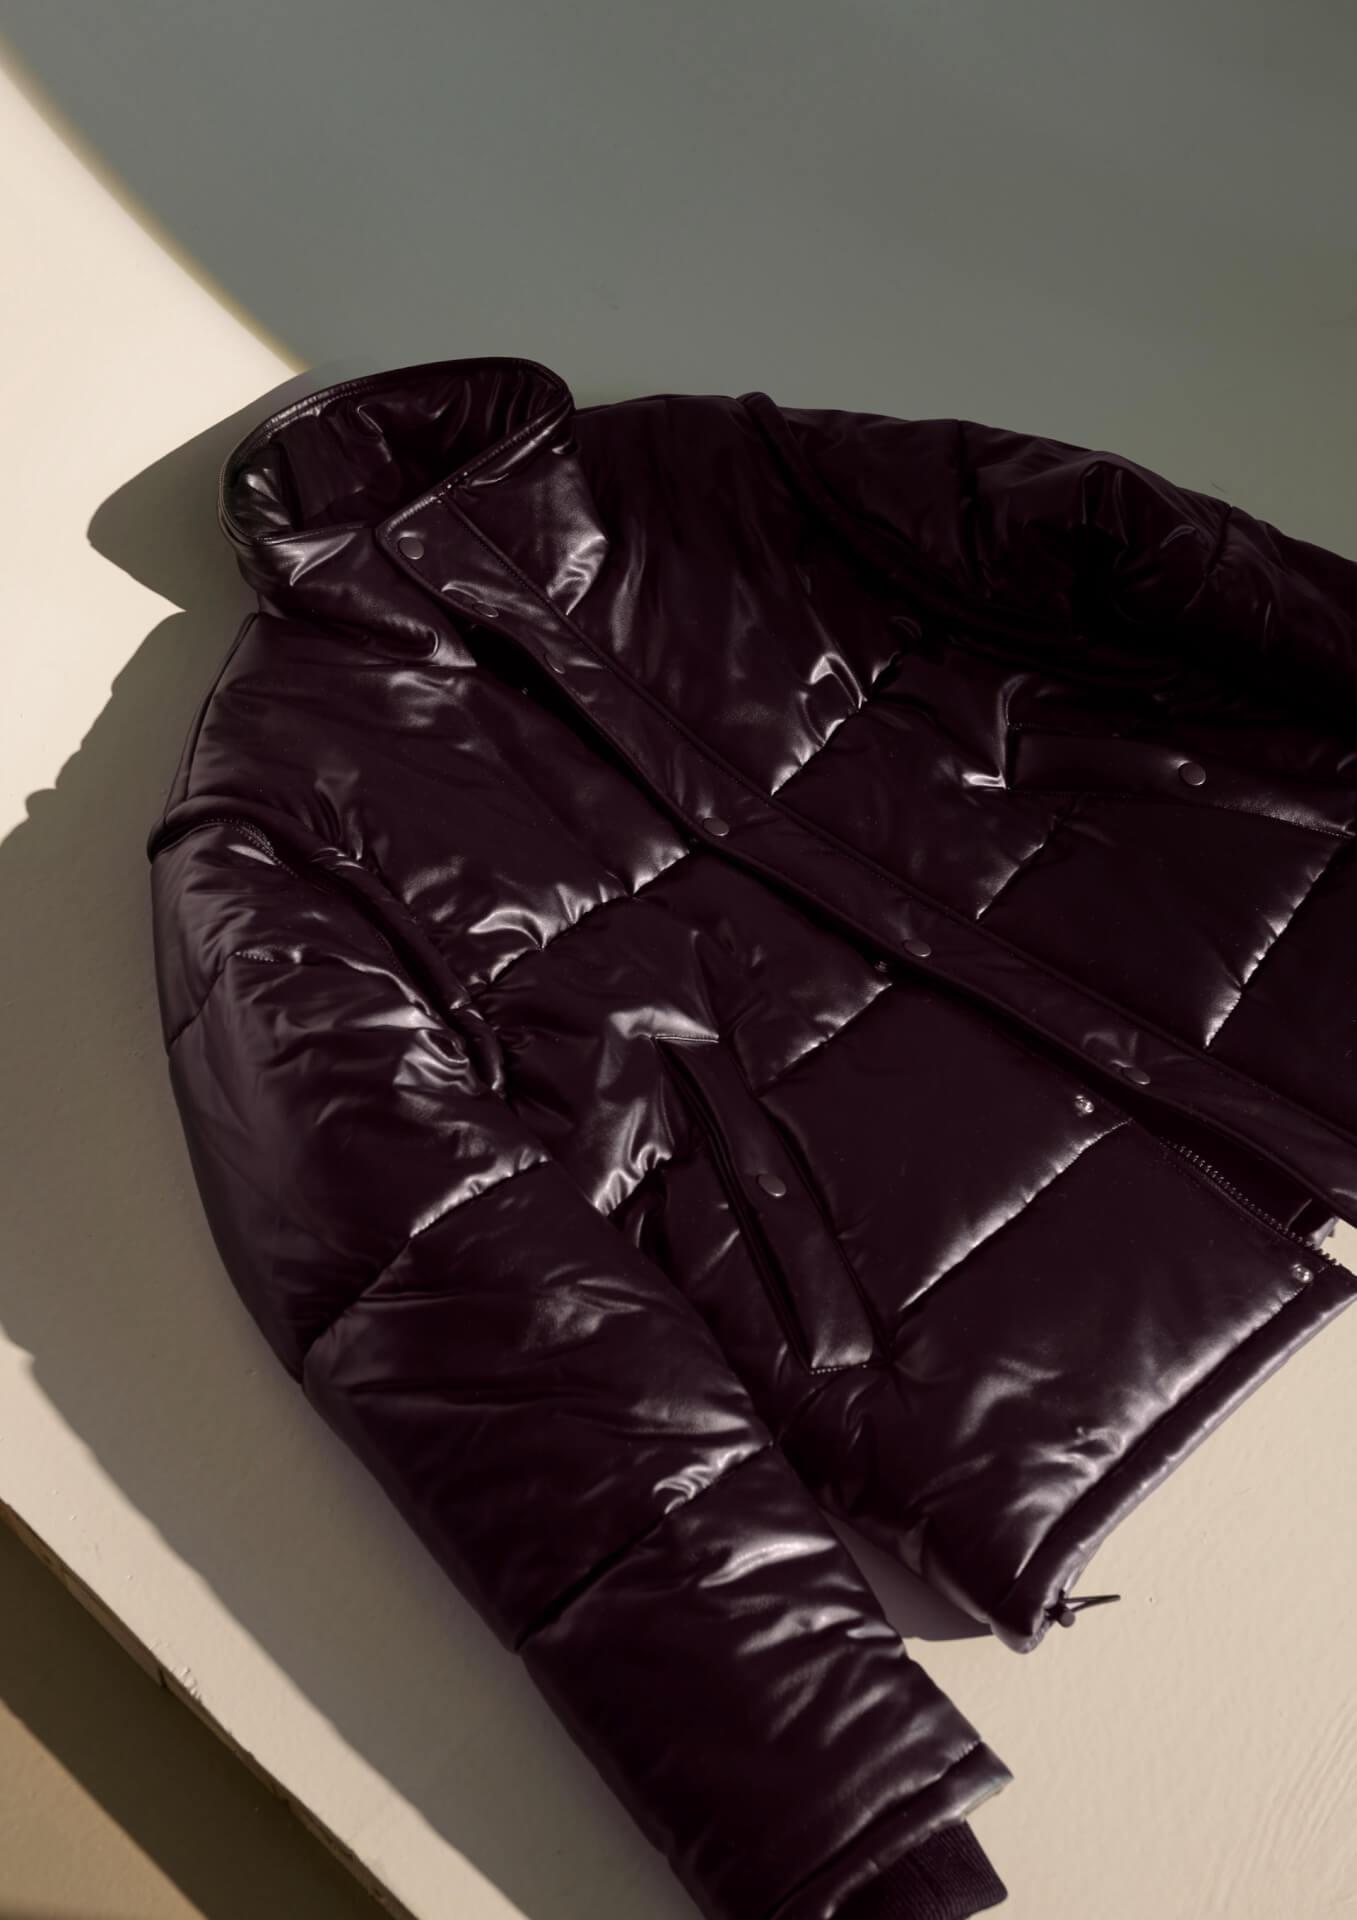 H&Mが俳優のジョン・ボイエガとタッグを組んだメンズウェアコレクションを発表!リサイクル素材、オーガニック素材を使用したアイテムが登場 life211006_handm_john_boyega_011